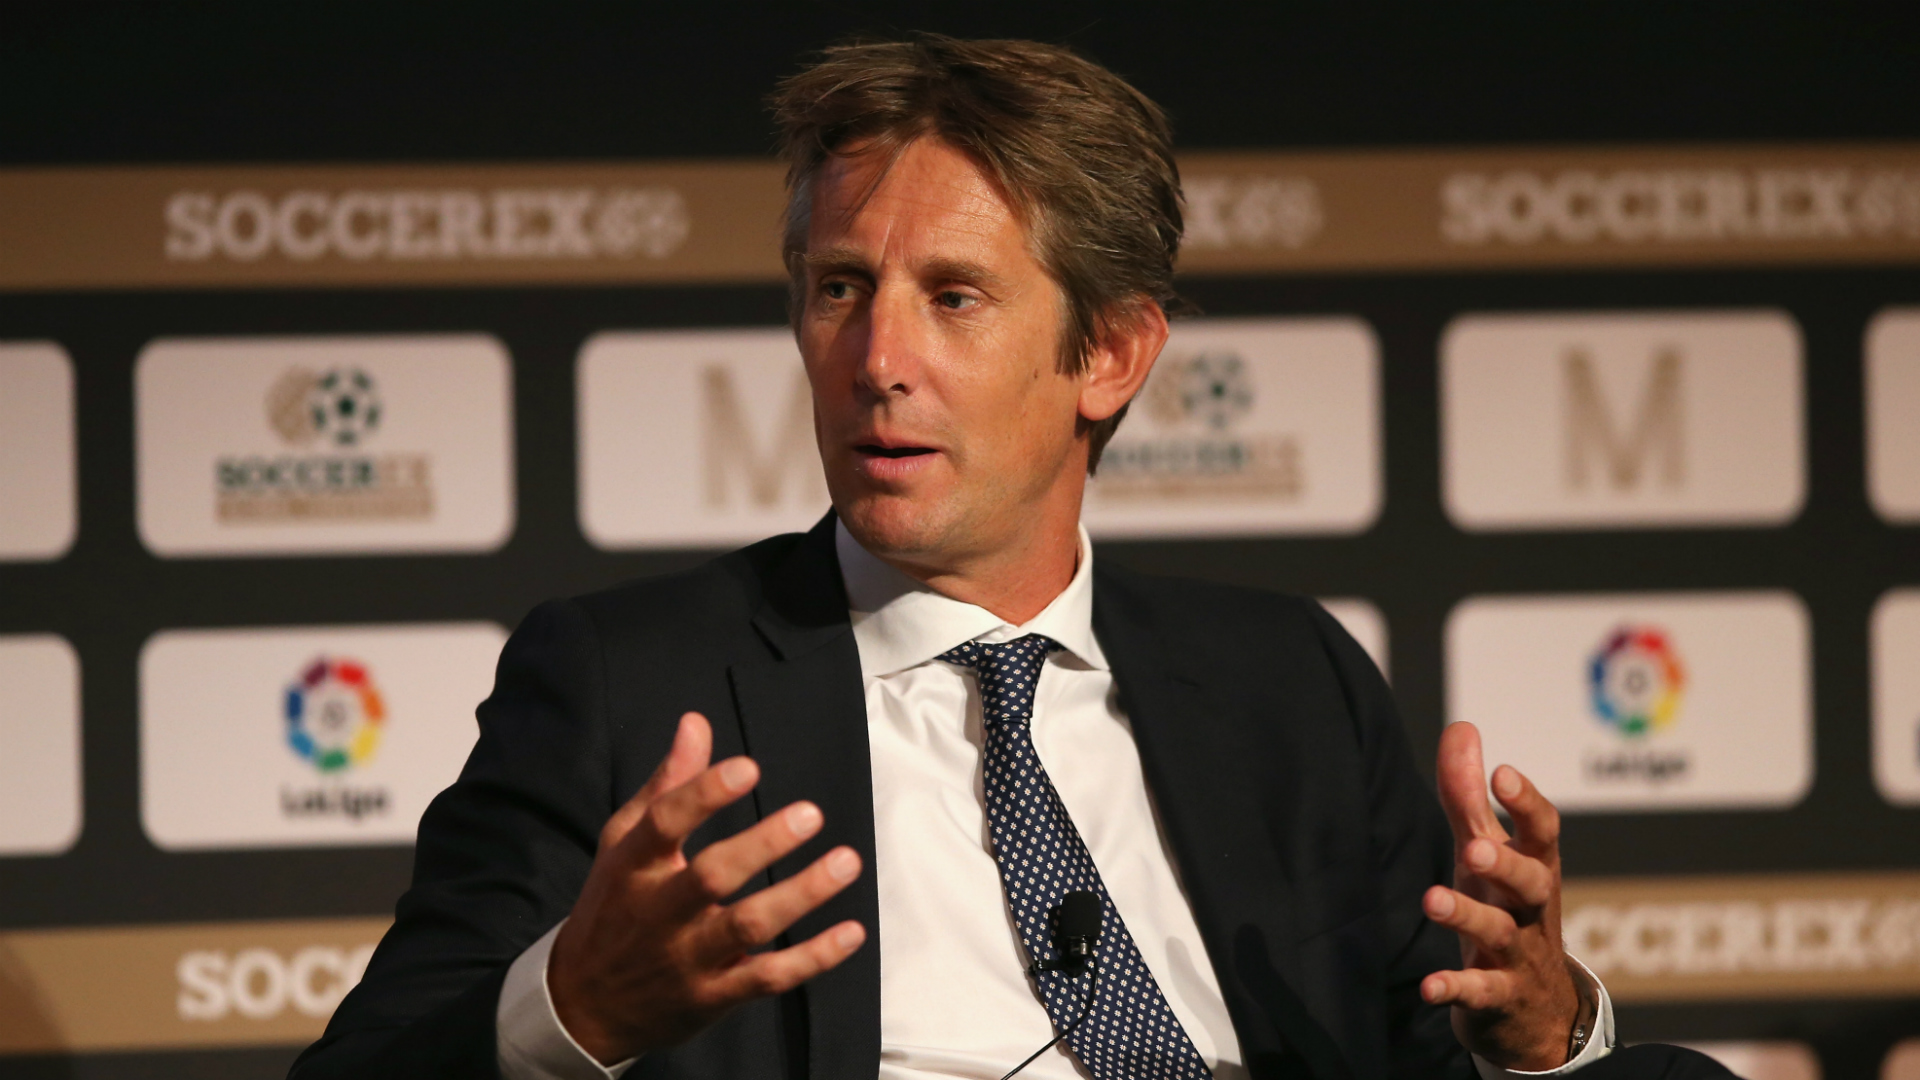 Van der Sar: Manchester United role would interest me